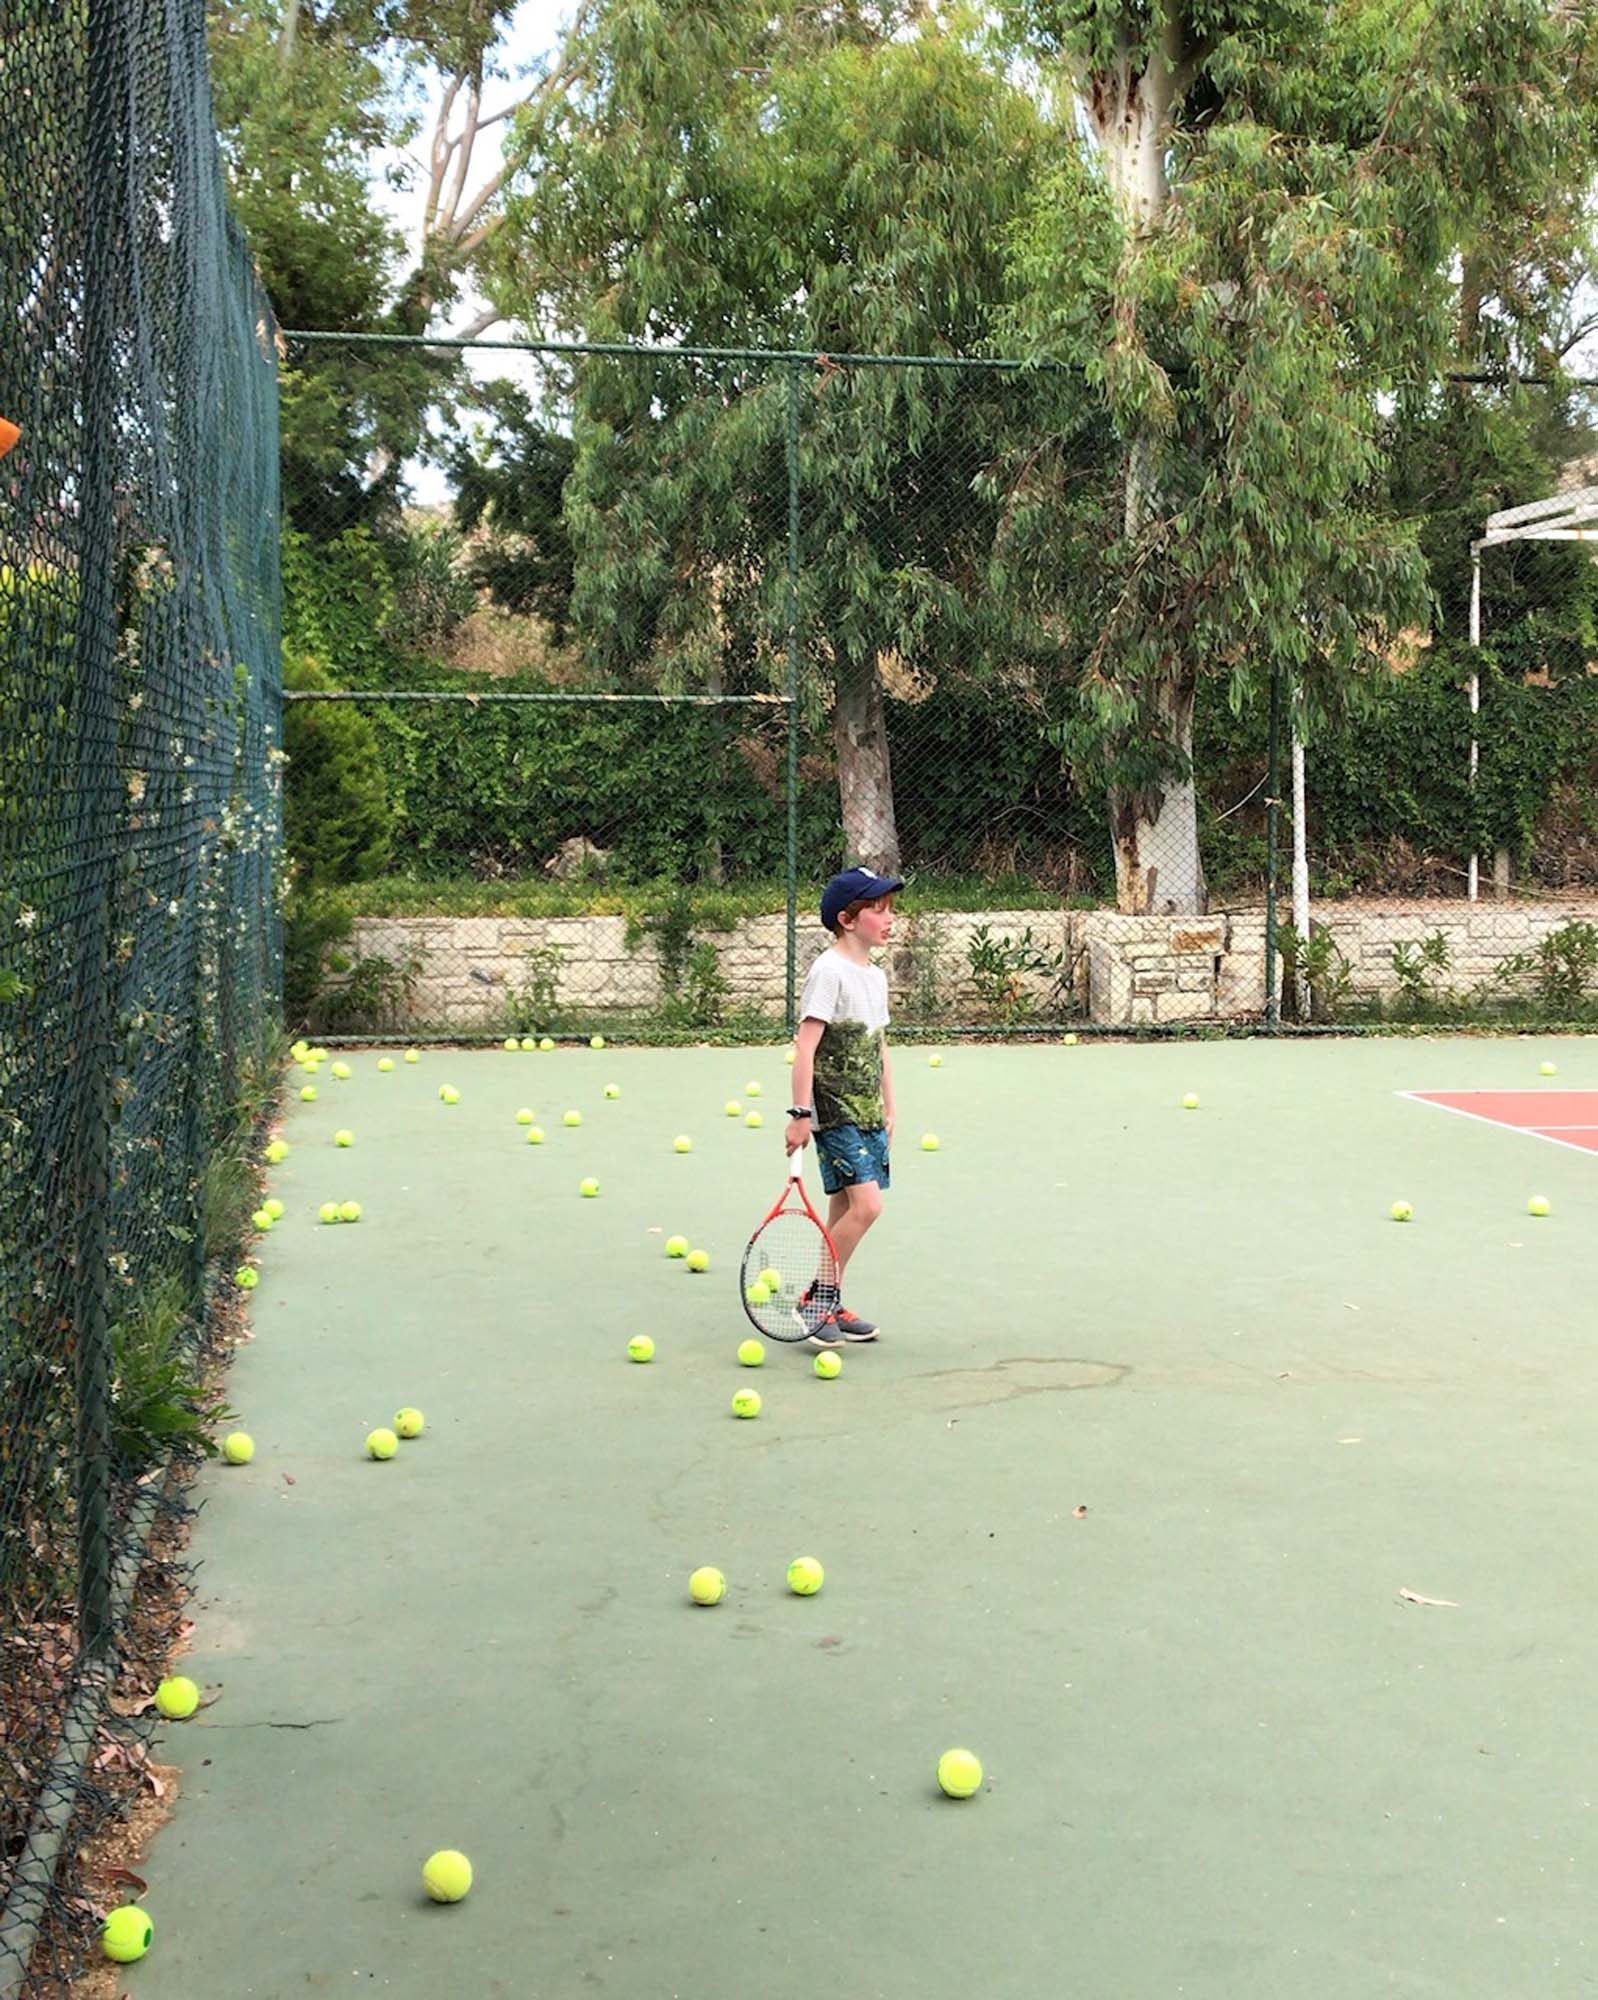 Oscar's tennis lesson